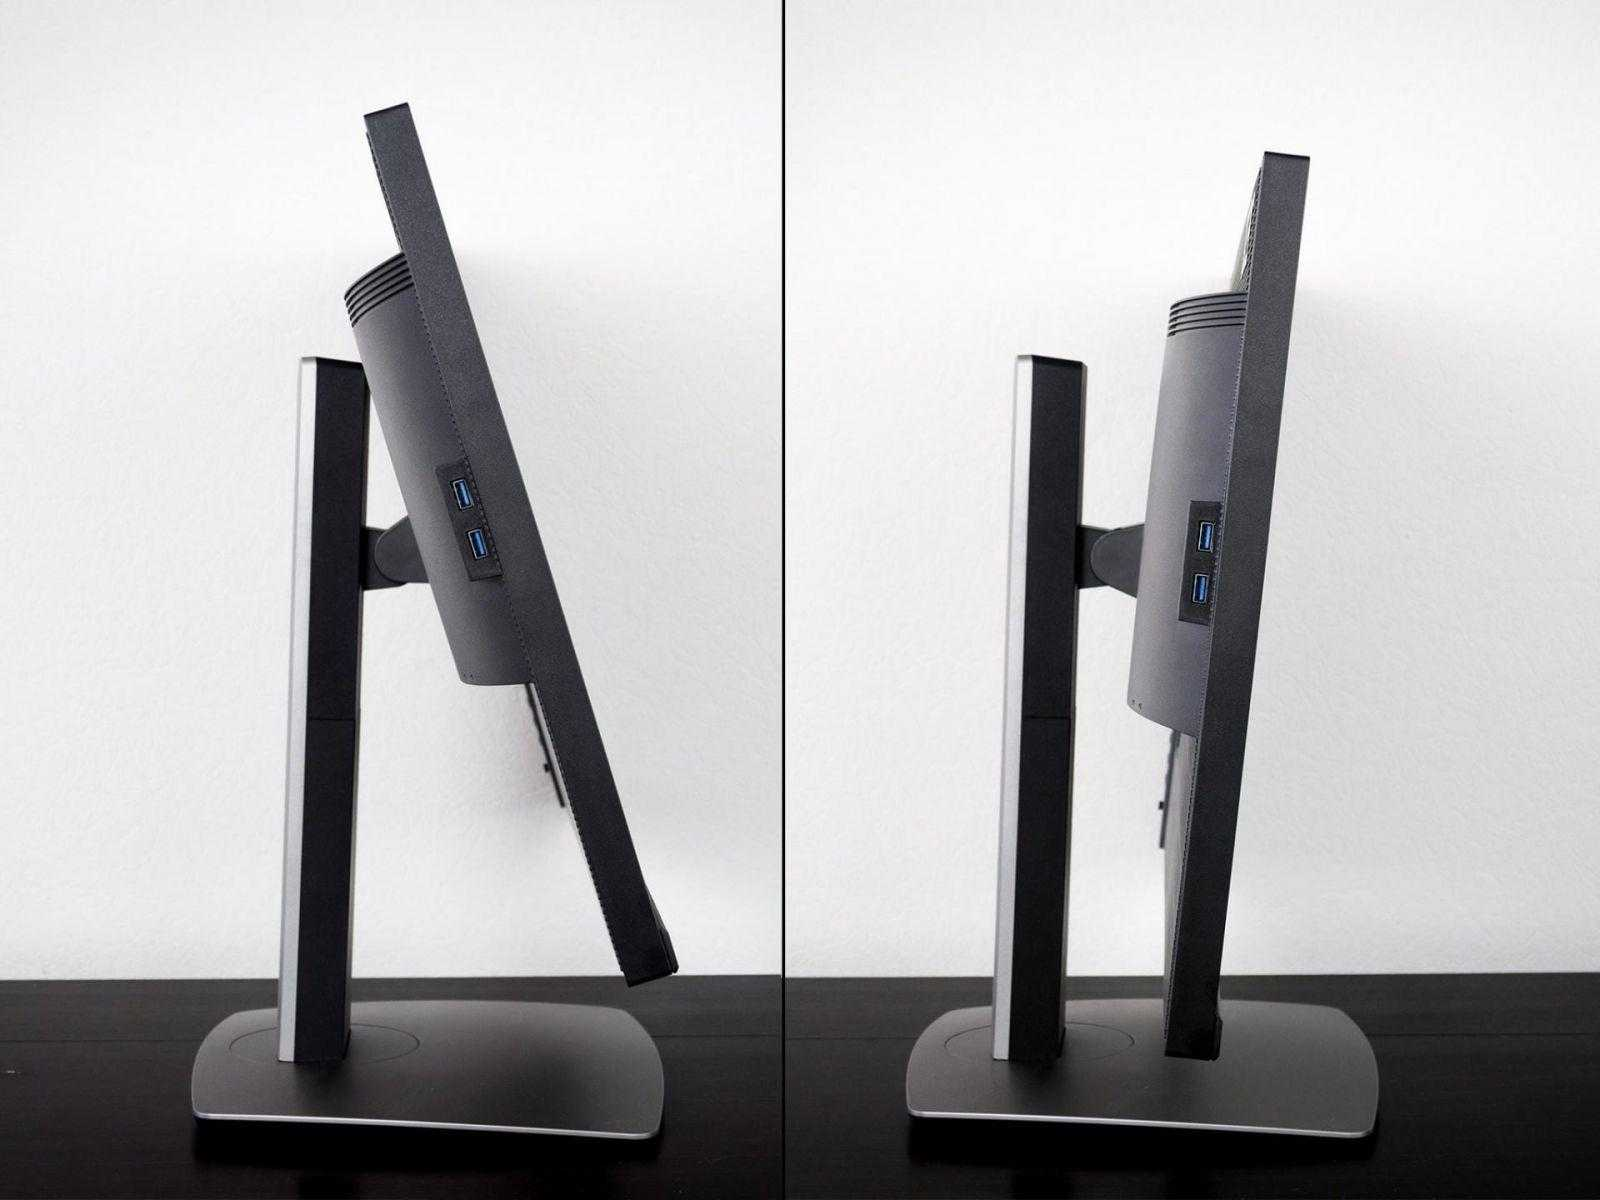 acer 320YaM07 - Обзор монитора Acer ProDesigner BM320